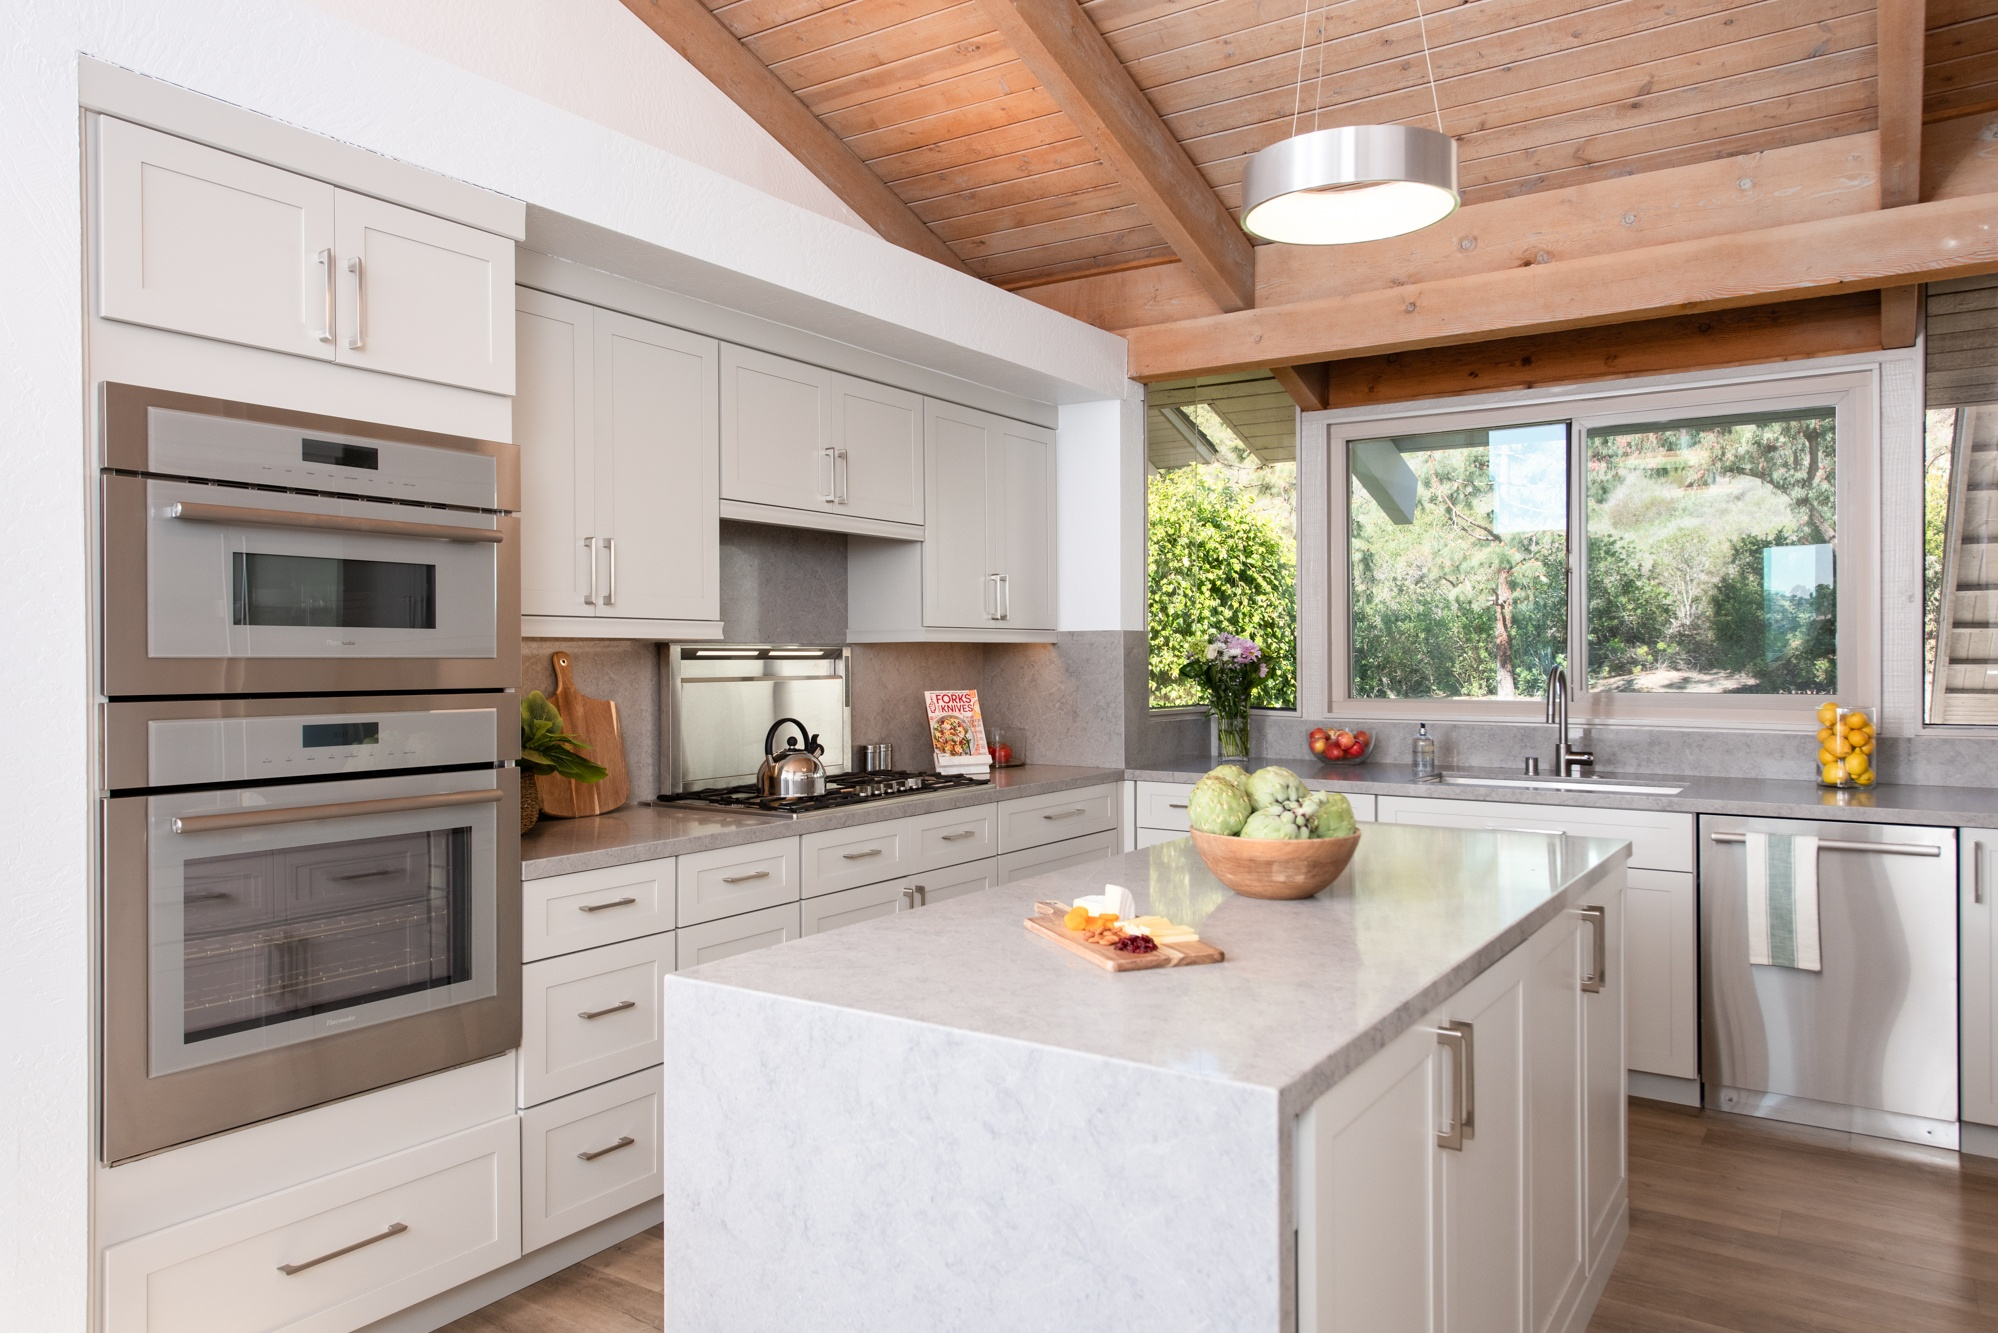 laguna-niguel-kitchen-renovation-with-matching-quartz-countertop-and-backsplash